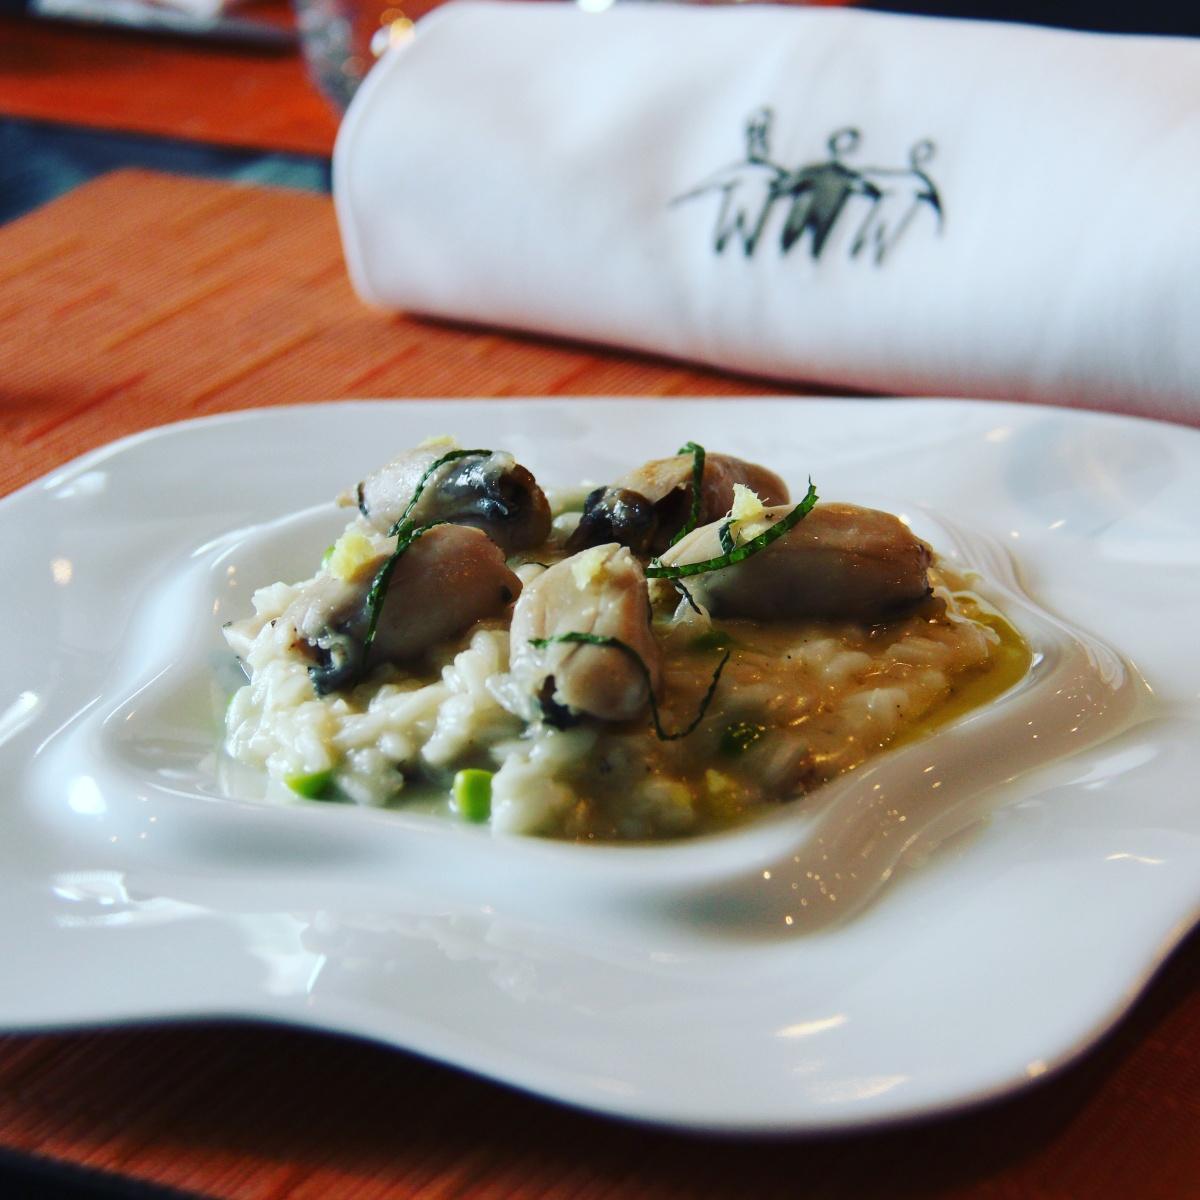 astuces r ussir le parfait risotto sharing cuisine. Black Bedroom Furniture Sets. Home Design Ideas